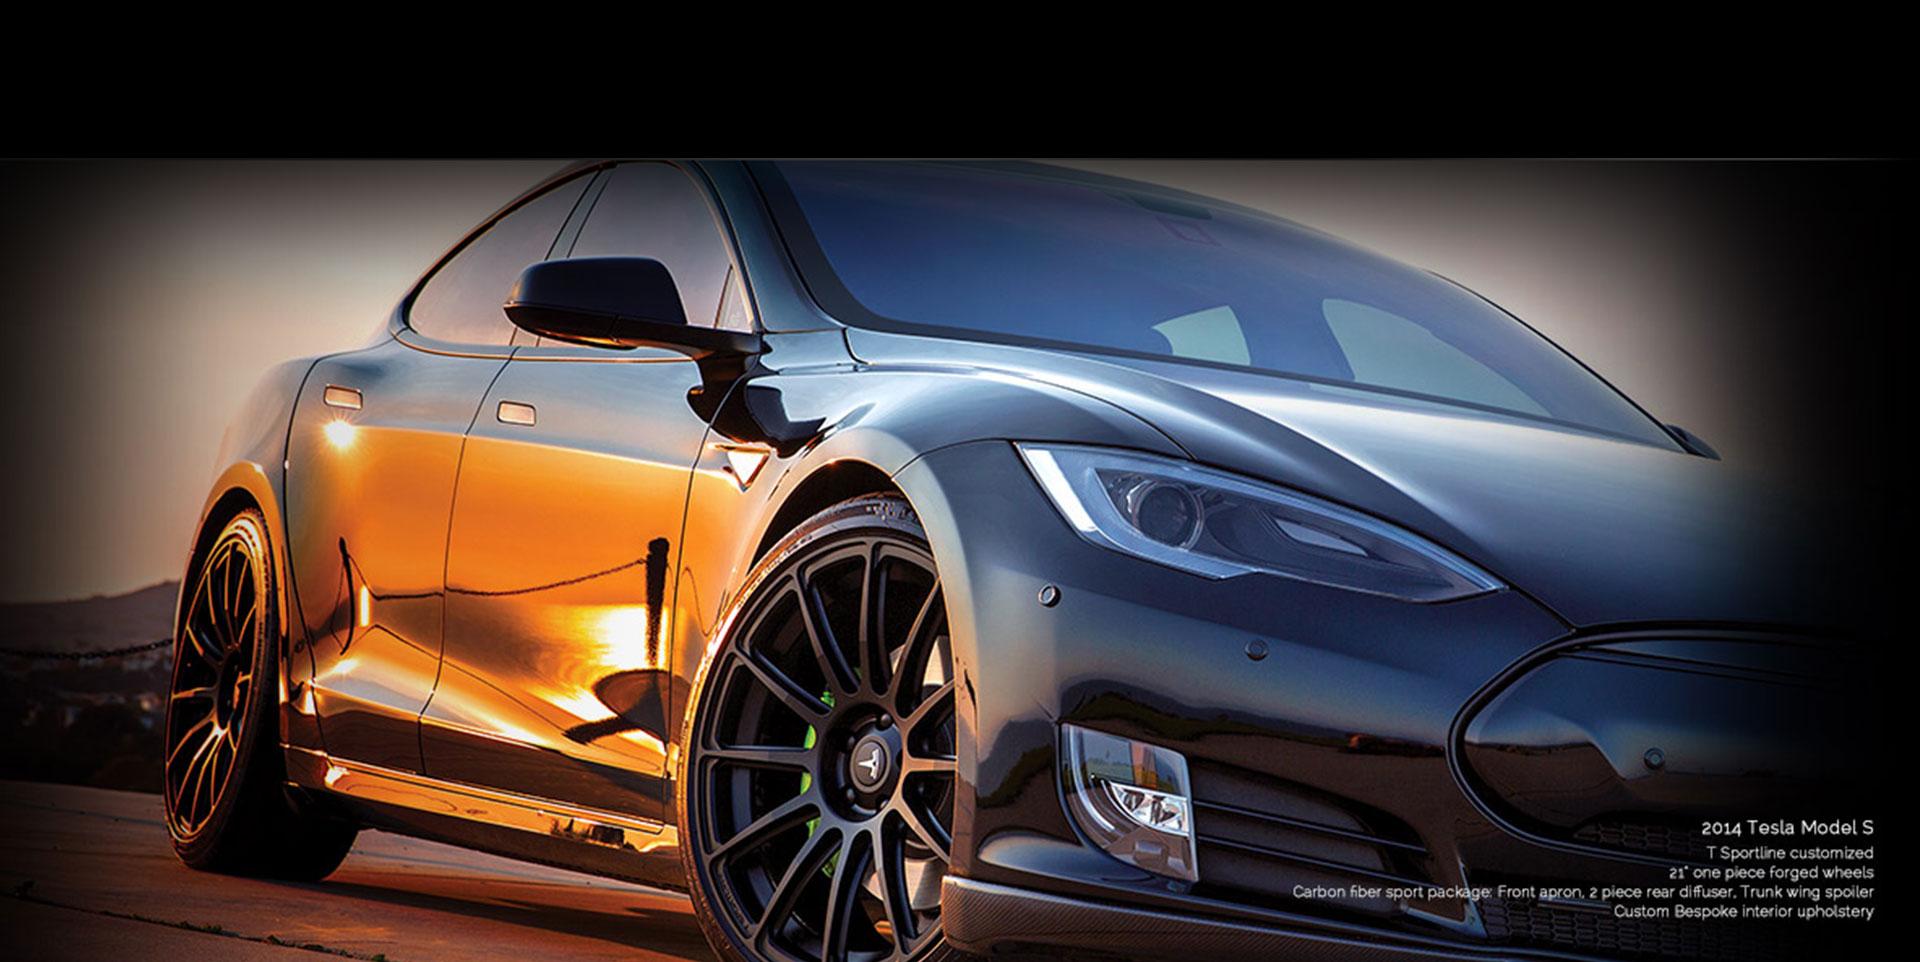 Meguiar's Tesla Model S 2014